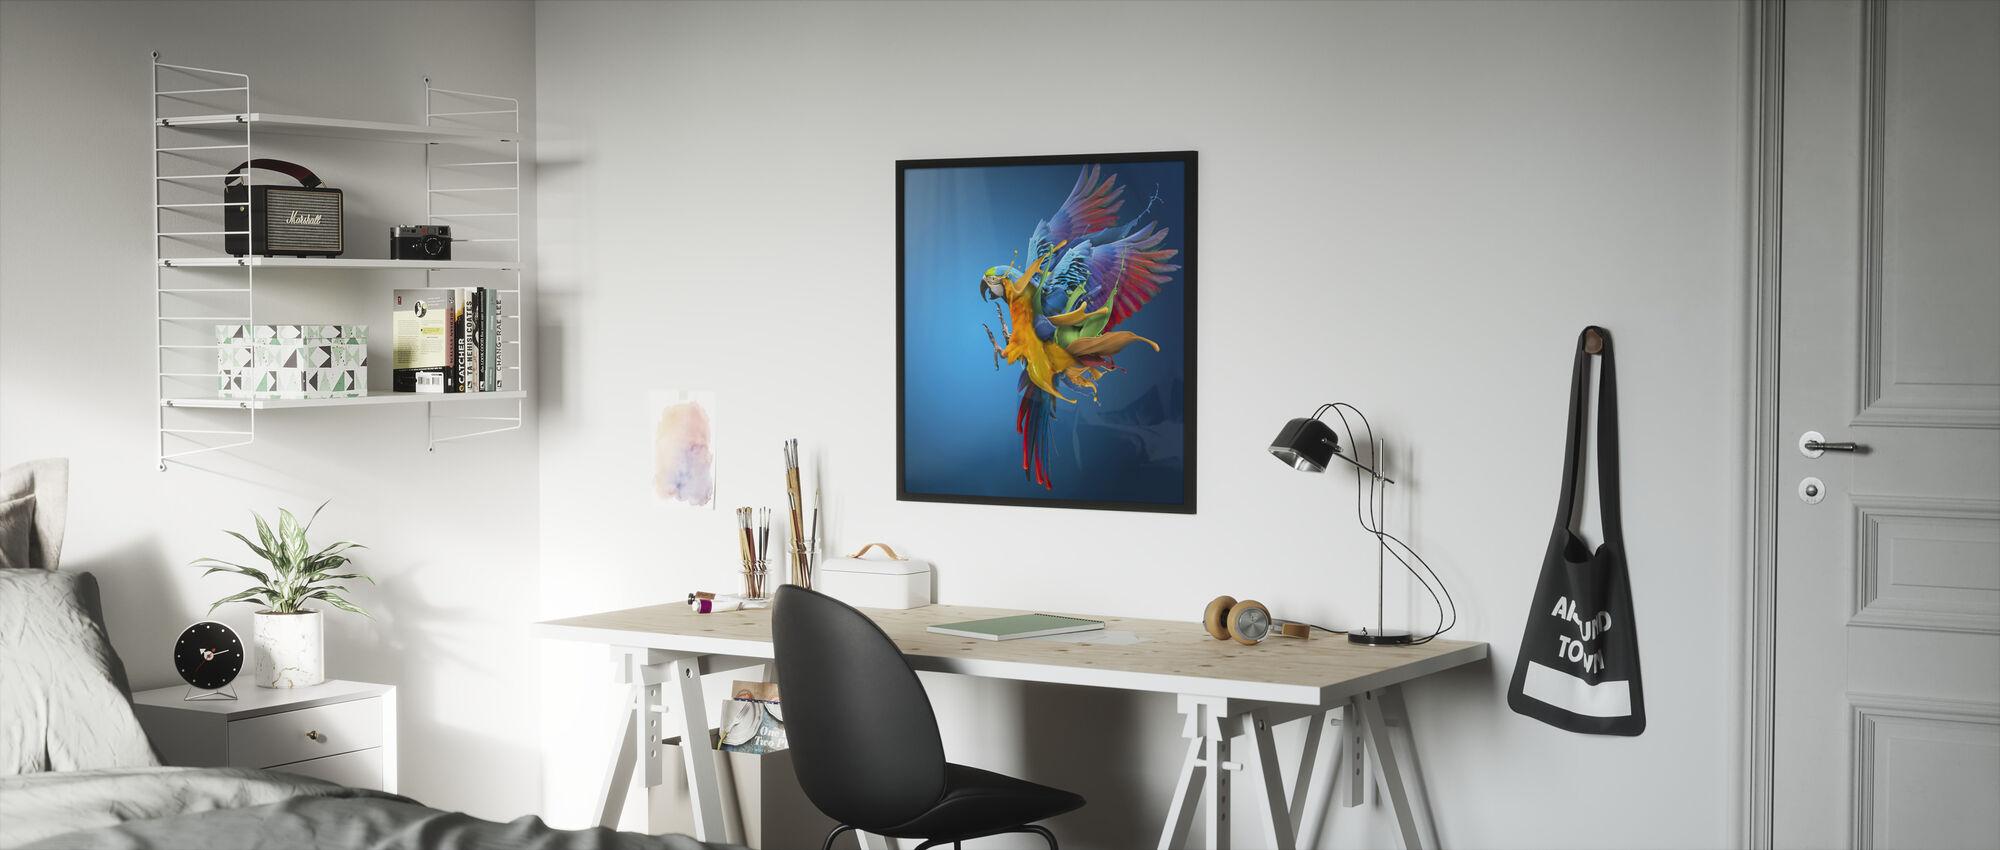 Flygende farger - Innrammet bilde - Barnerom